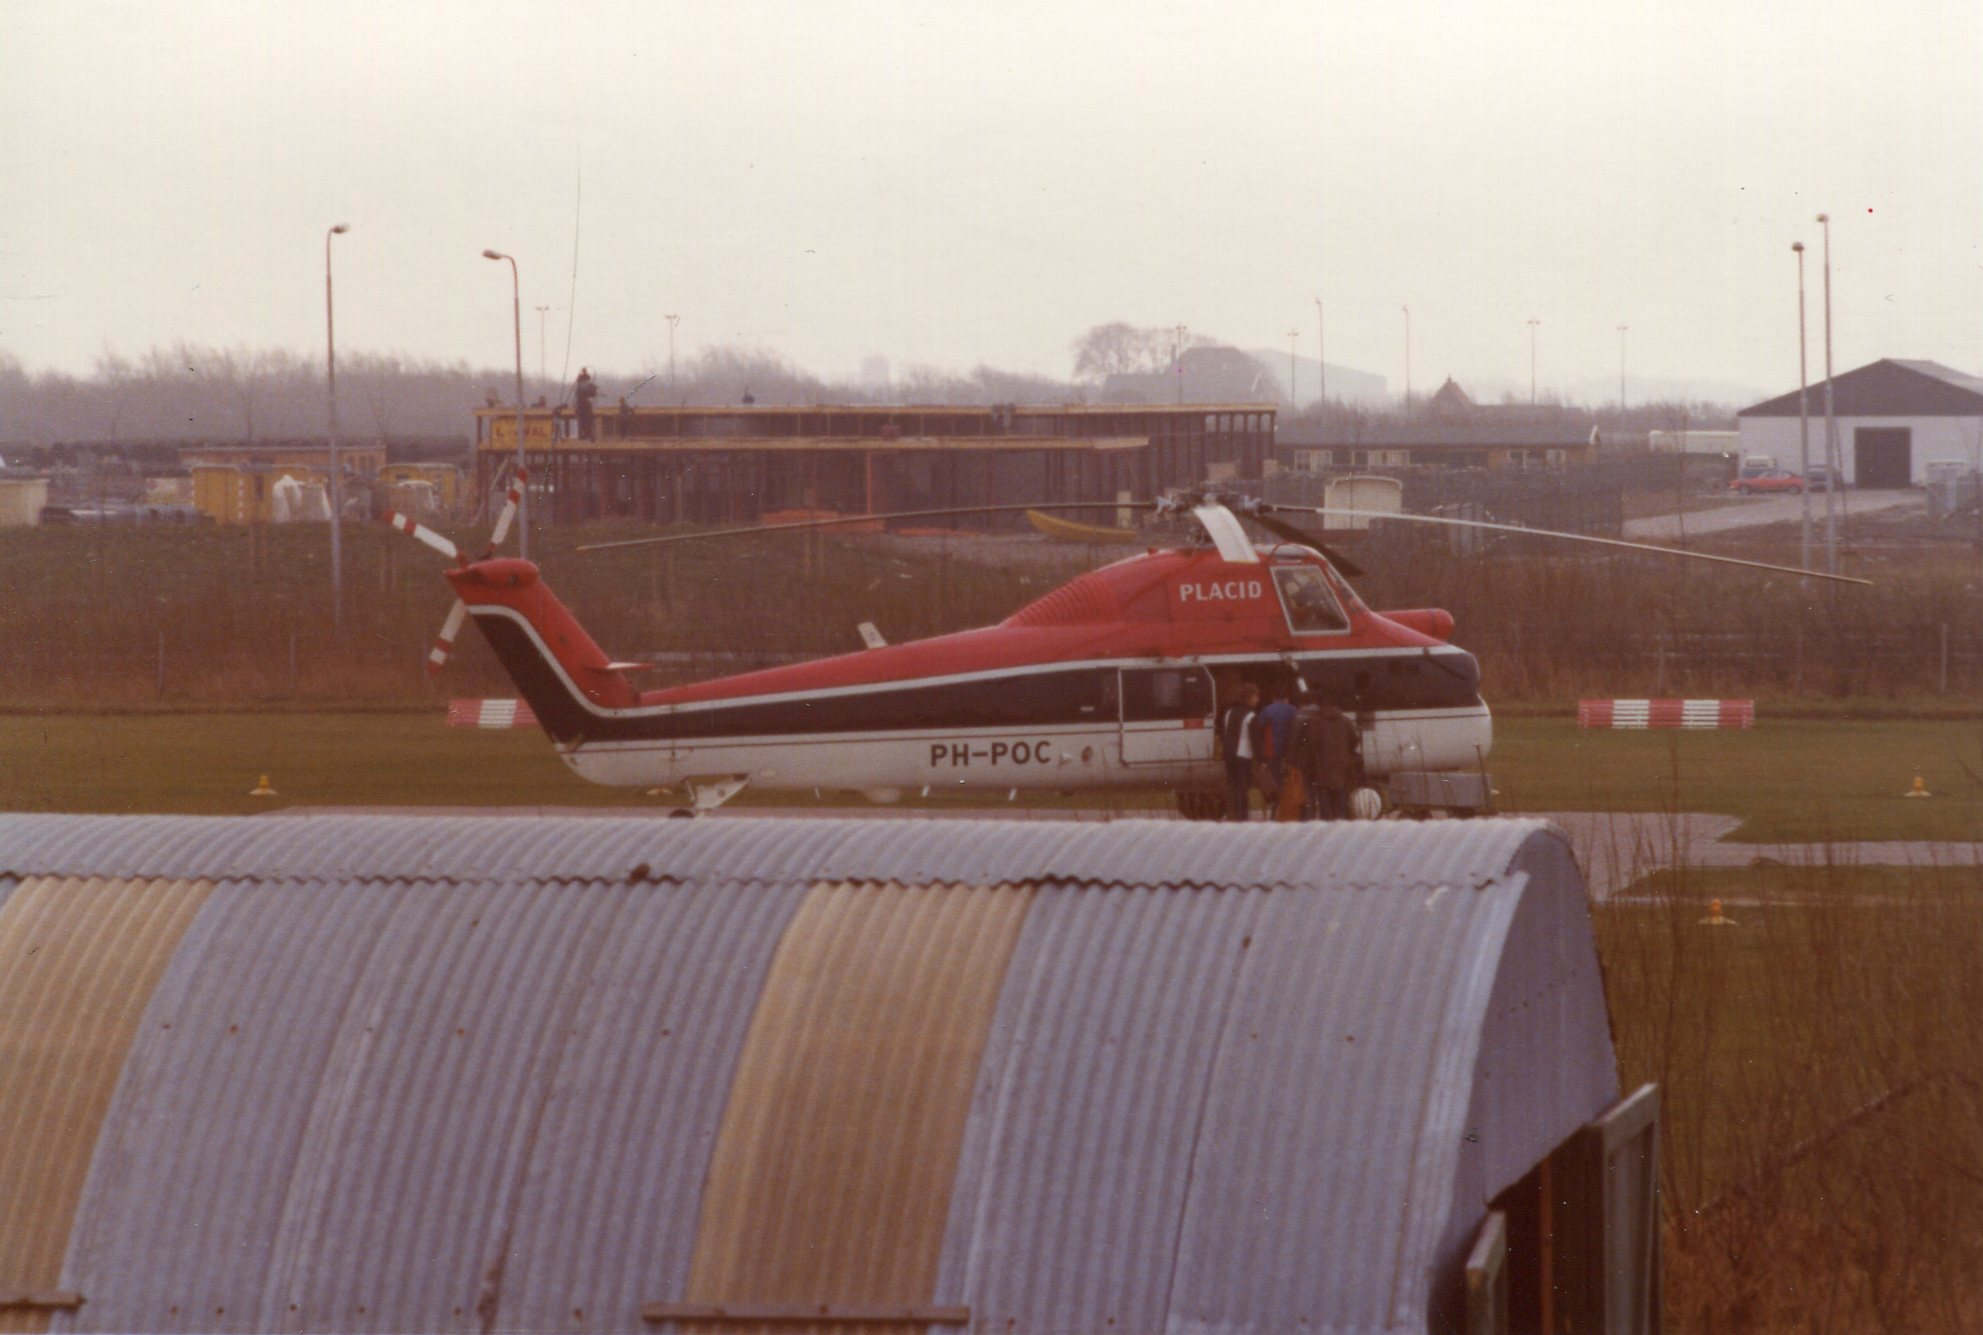 Naam: Den Helder , april 1977 (2).jpg Bekeken: 549 Grootte: 271,9 KB